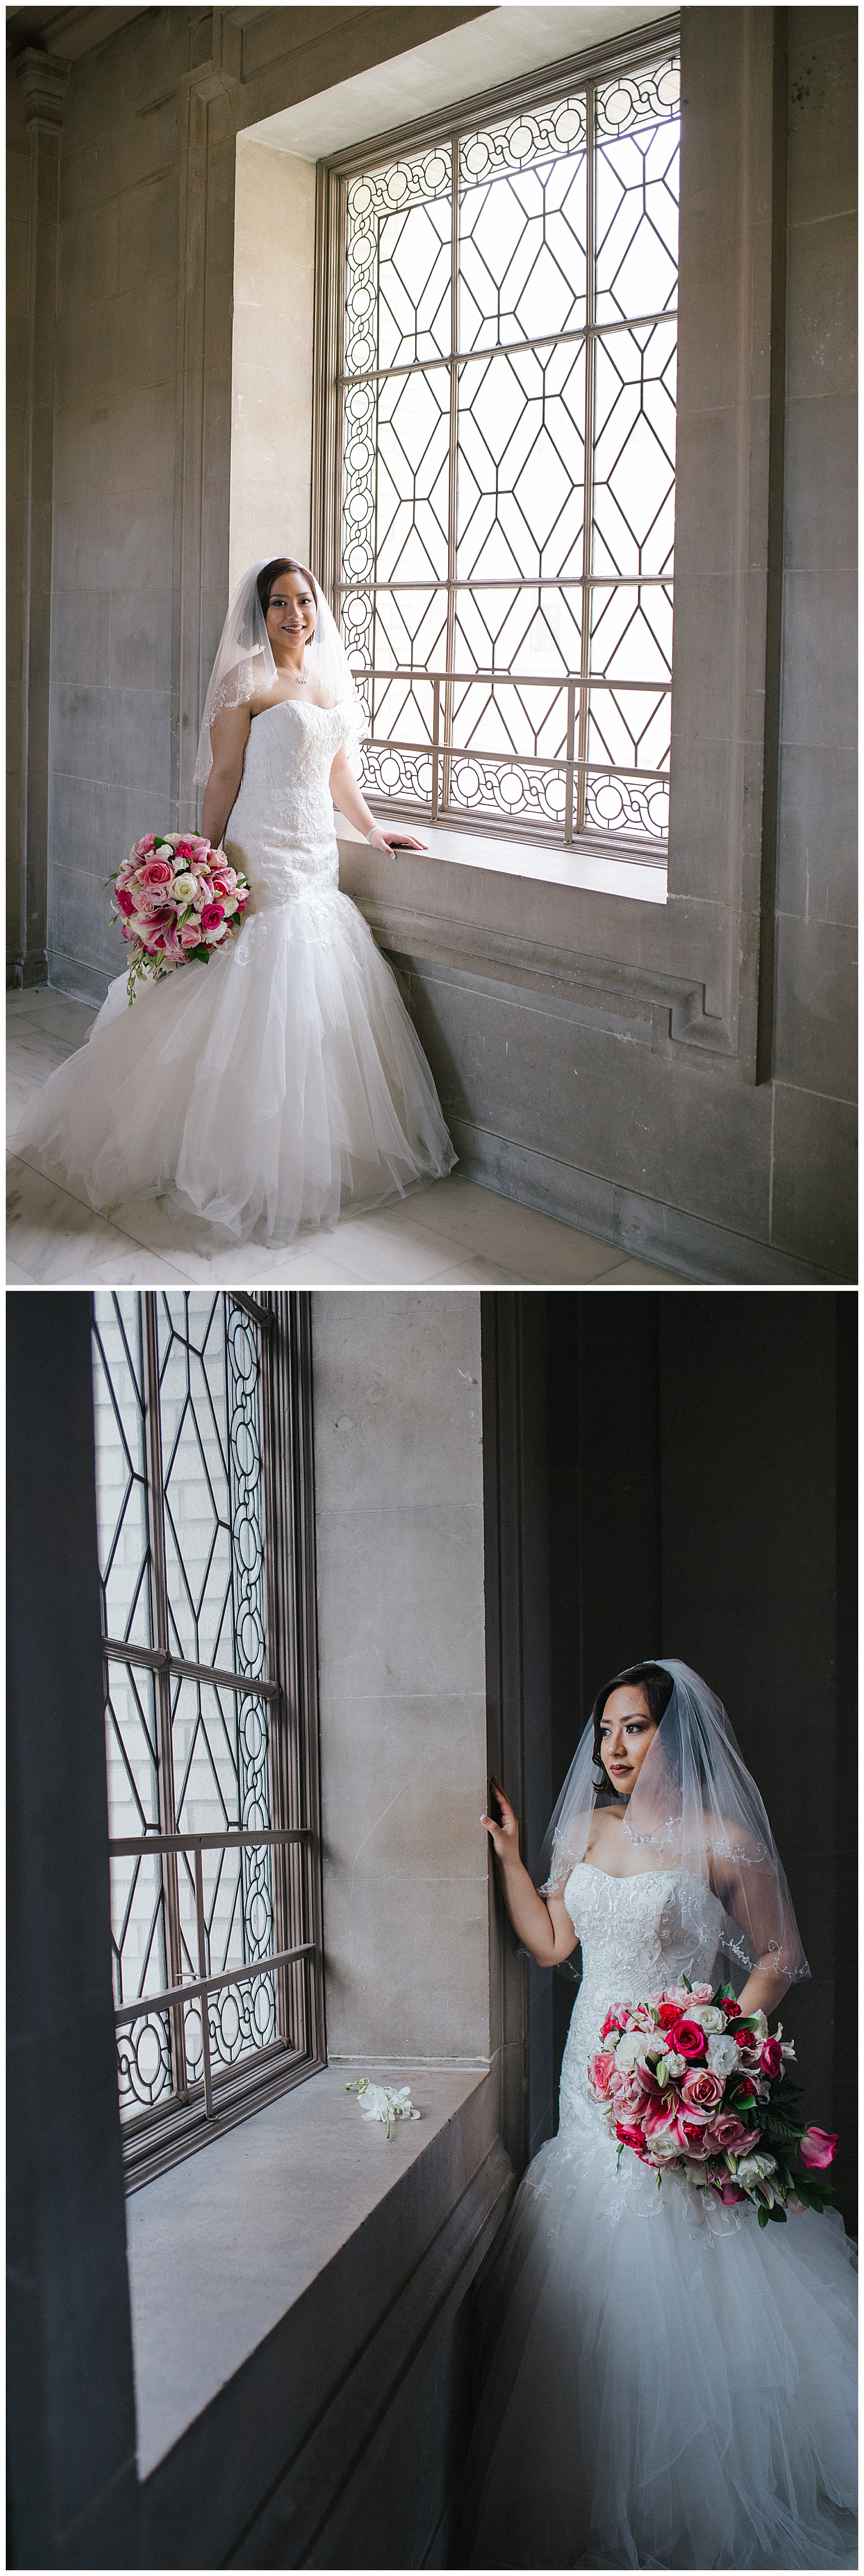 khariza-rae-photography-bay-area-wedding-photographer_0114.jpg